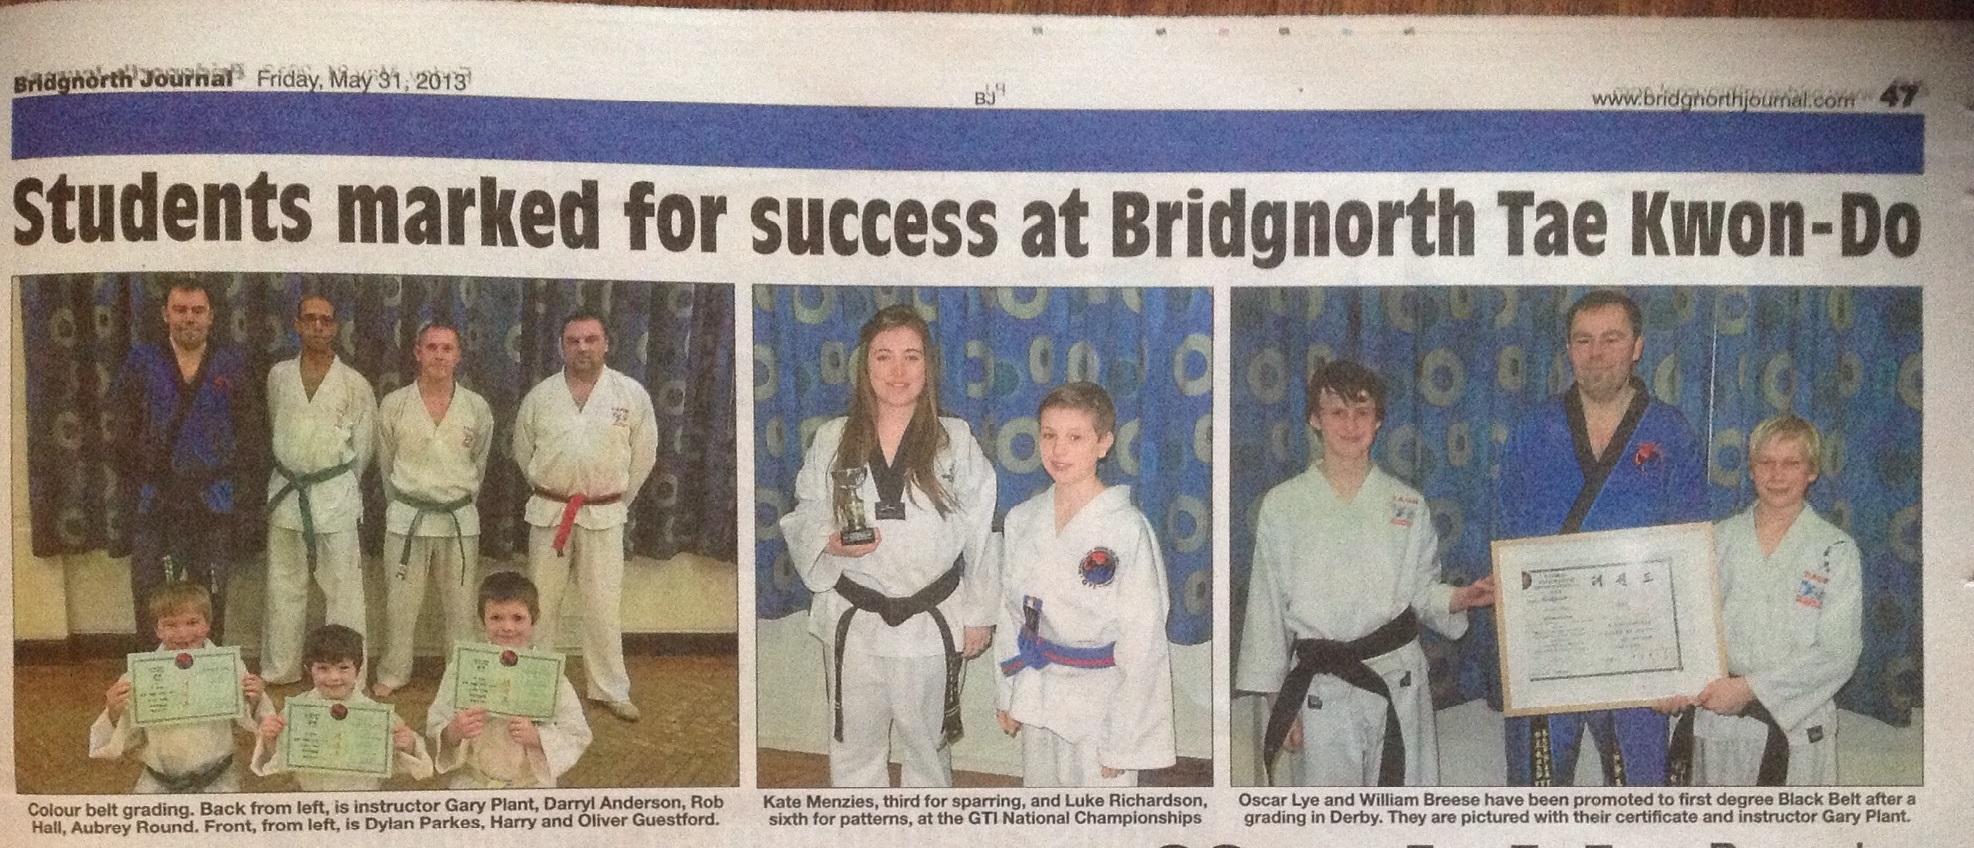 Celebrating more successes in the Bridgnorth Journal.